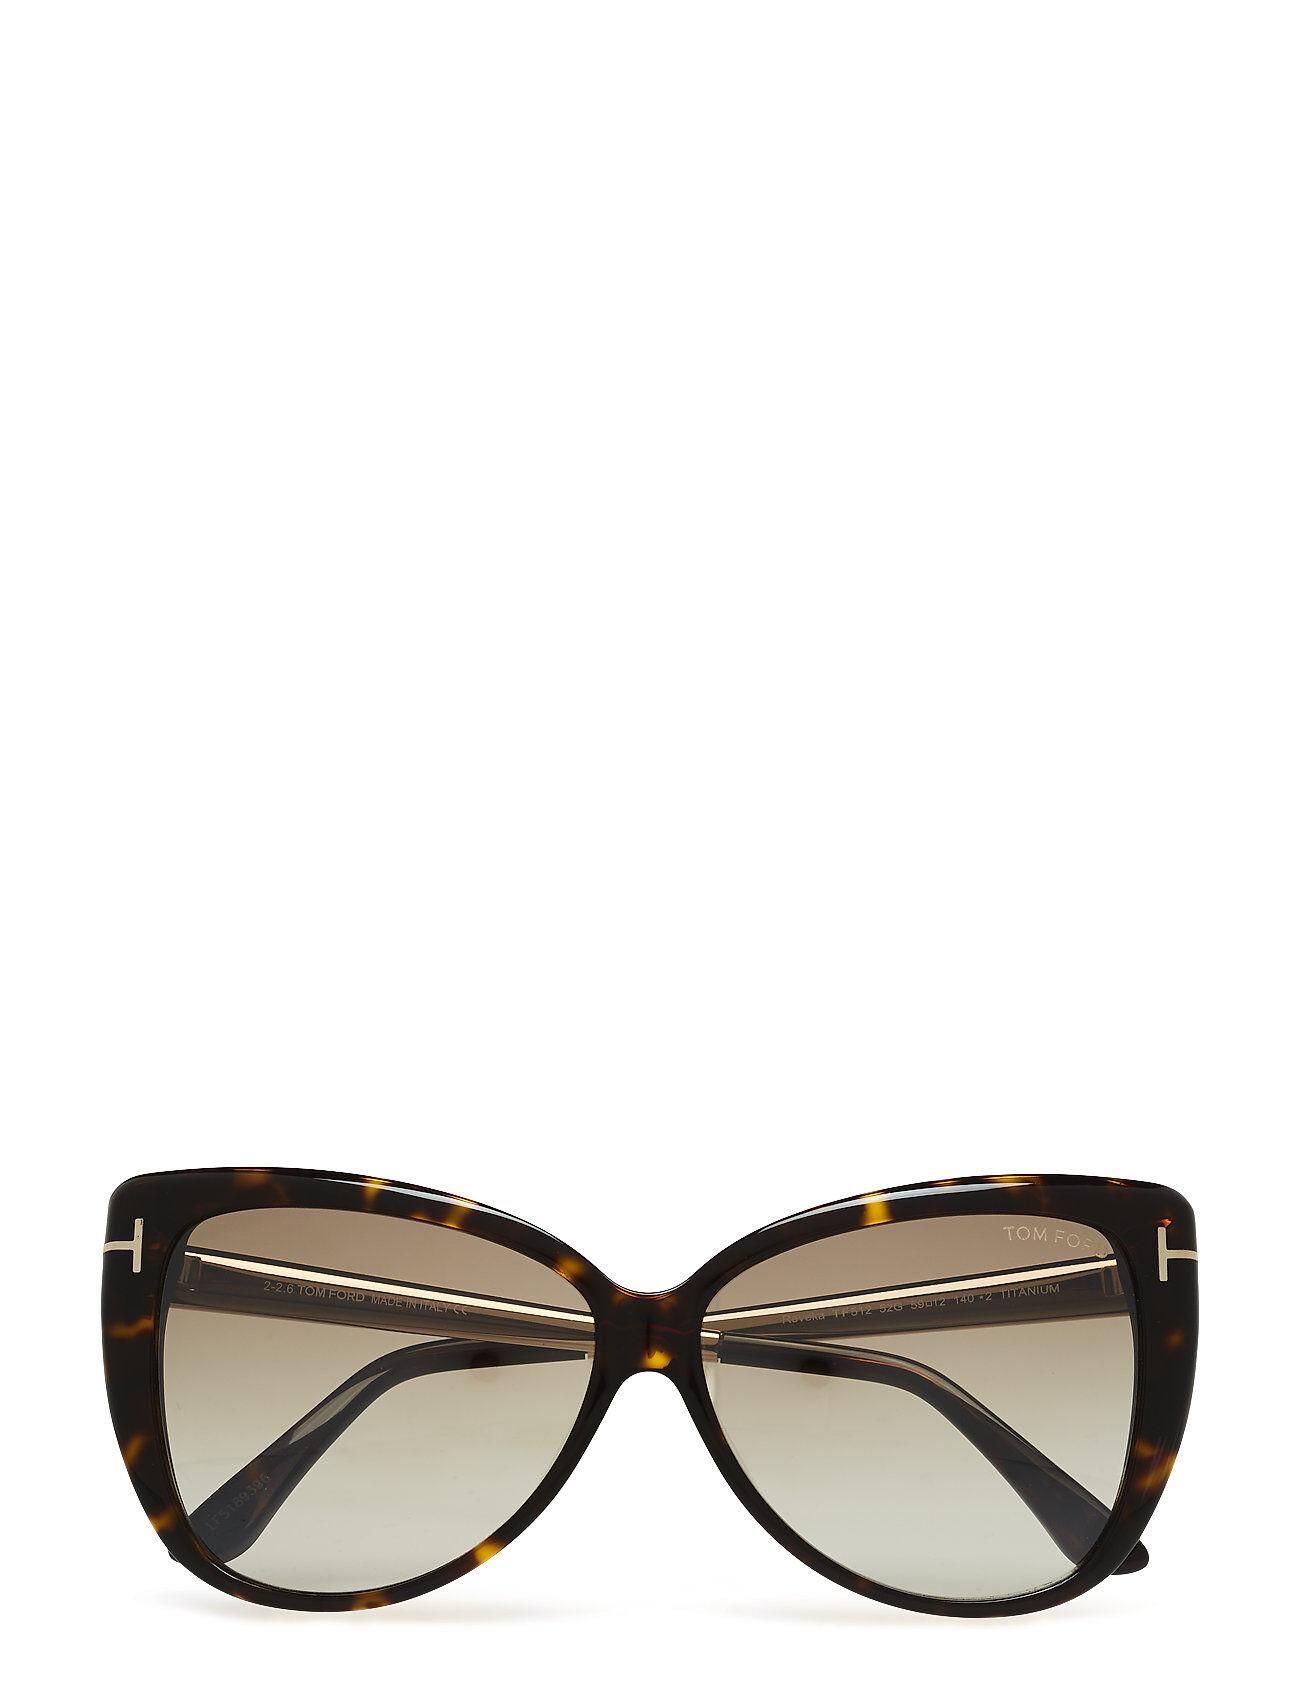 Image of Tom Ford Sunglasses Tom Ford Reveka Aurinkolasit Ruskea Tom Ford Sunglasses